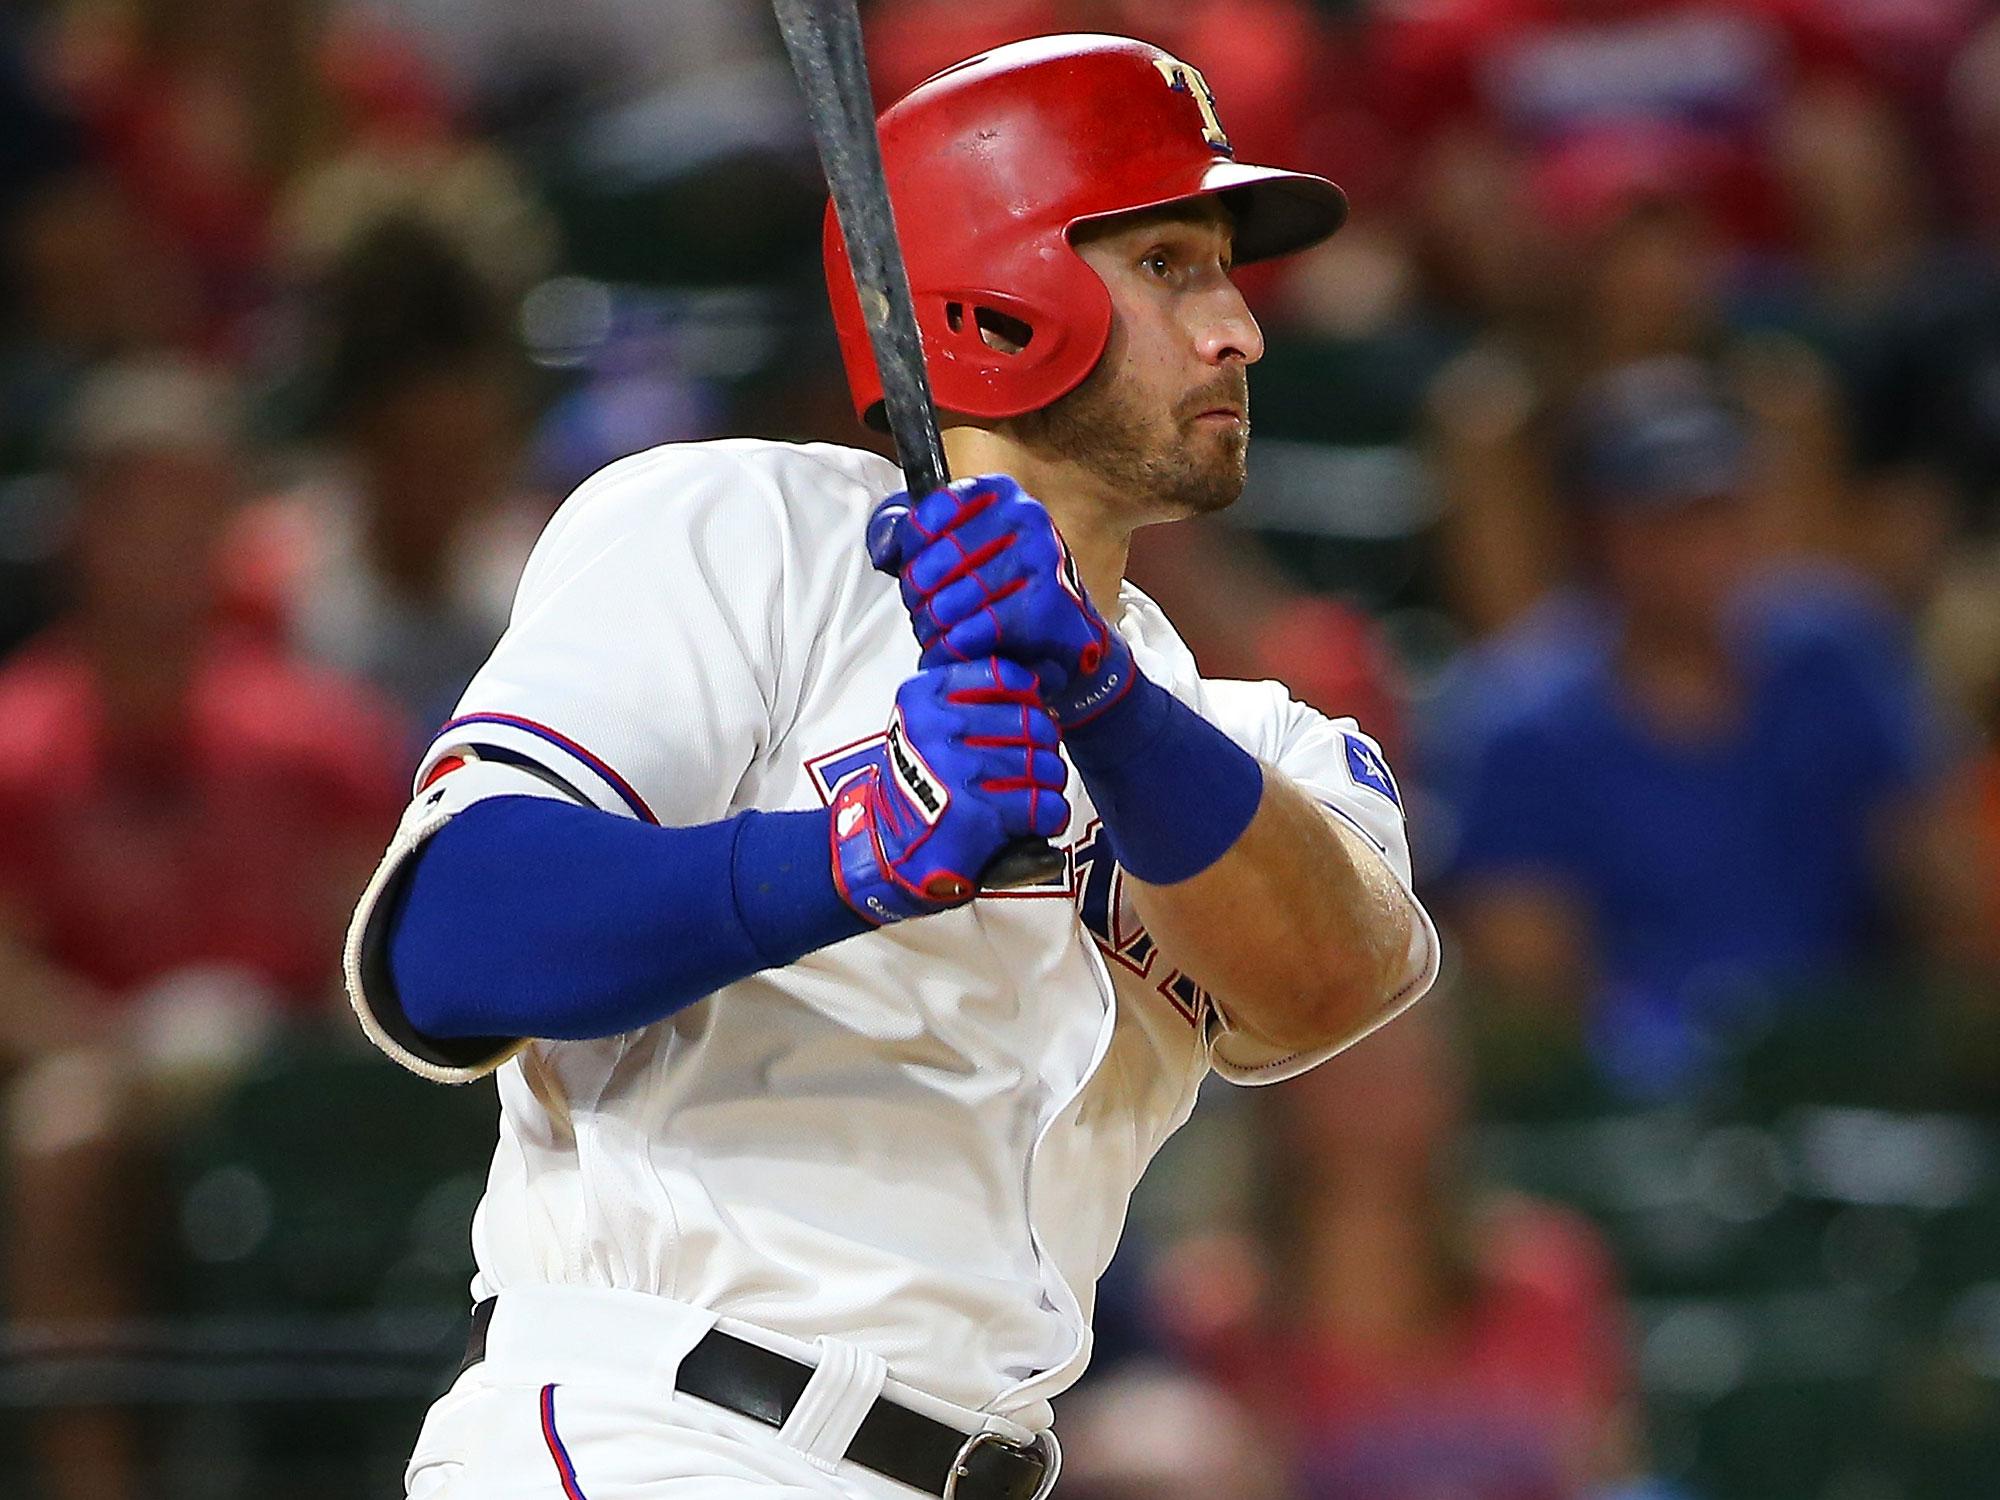 Joey Gallo, Texas Rangers